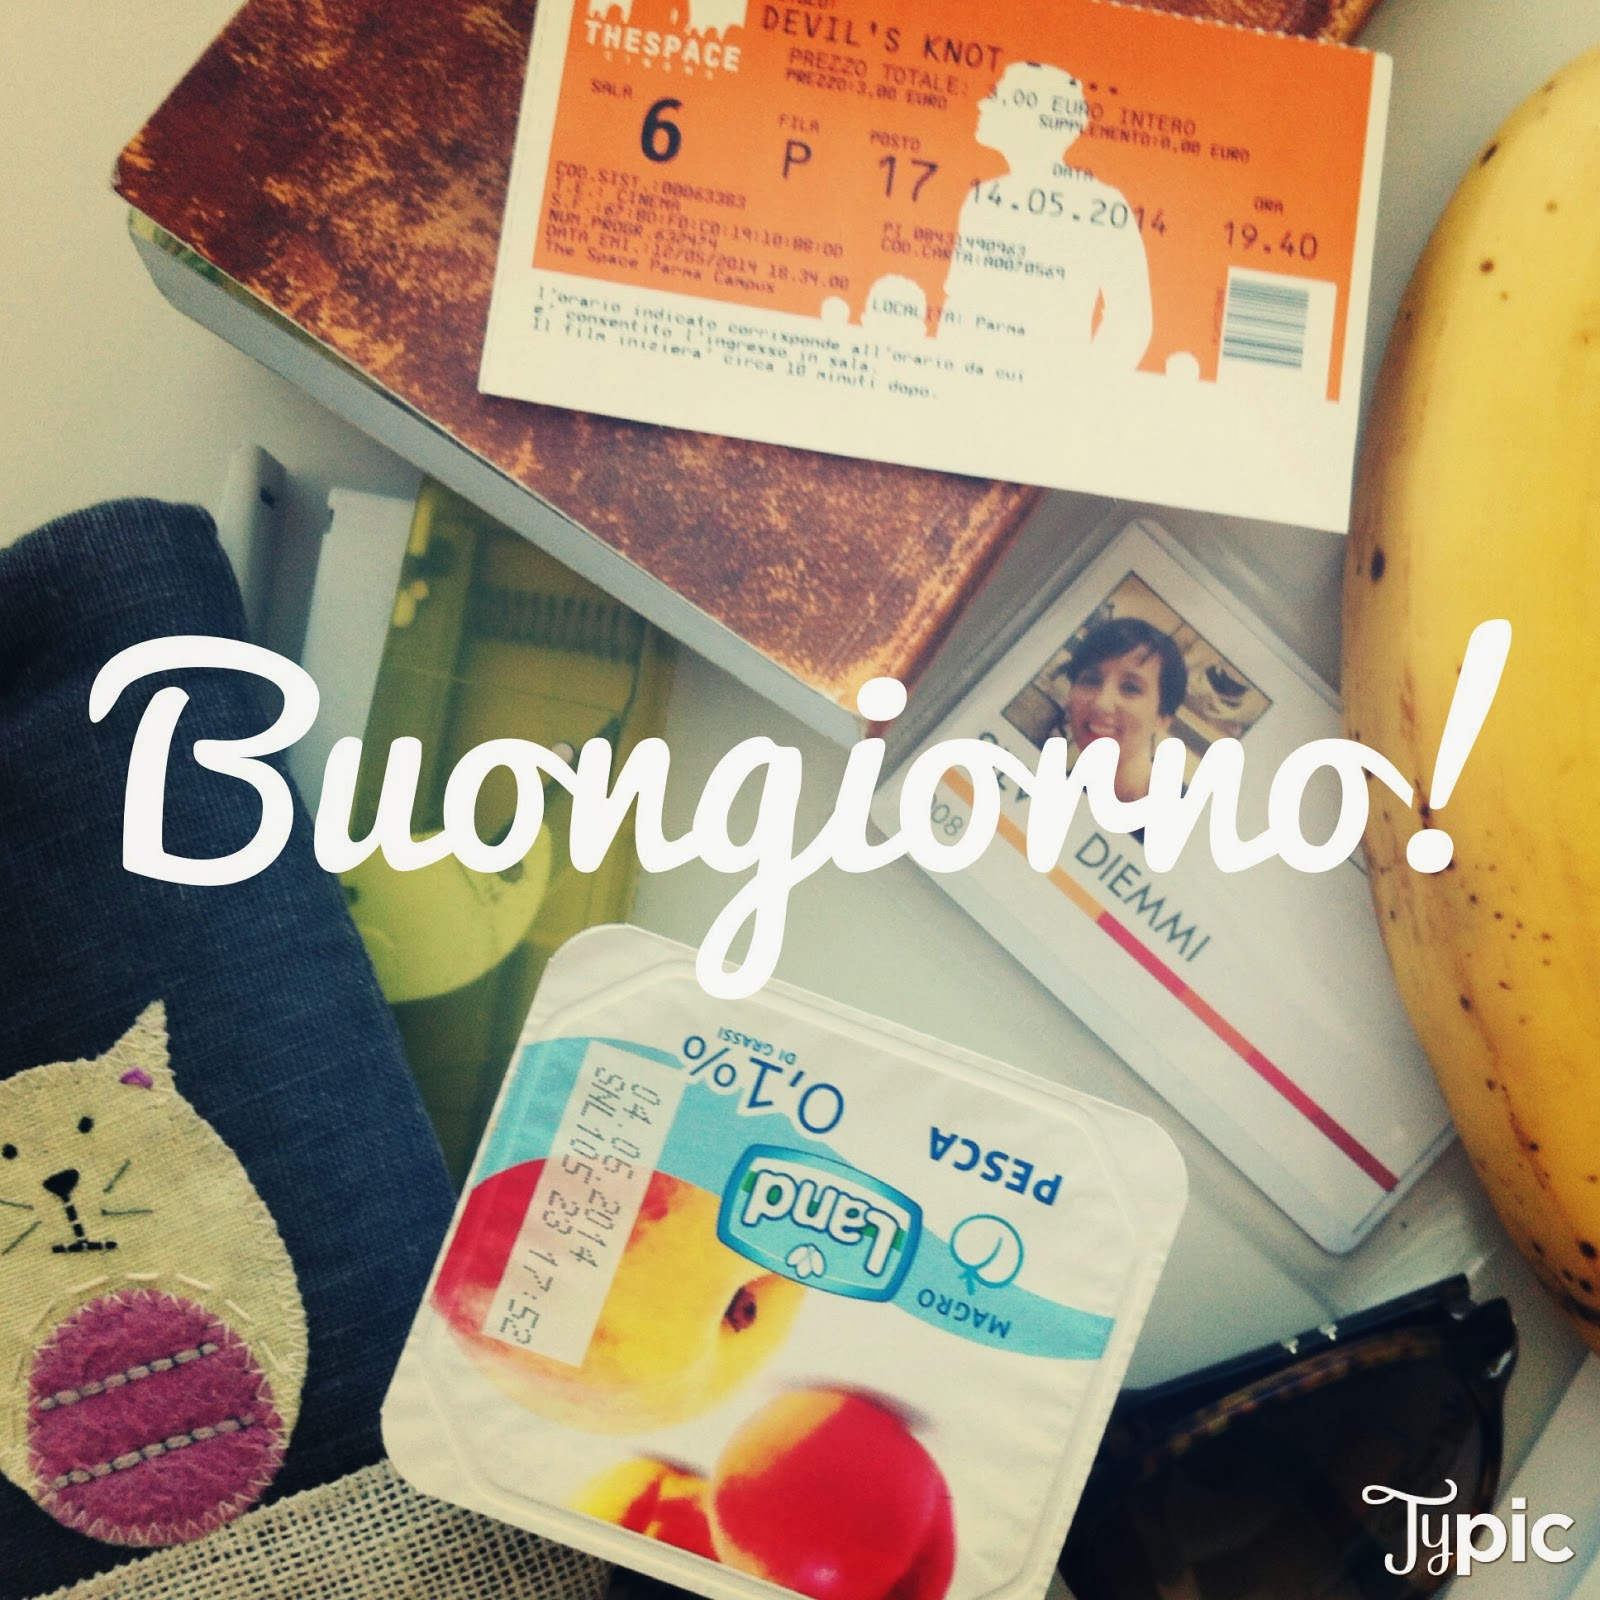 banana e cioccolato, silvia diemmi, silvia diemmi blog, banana e cioccolato blog